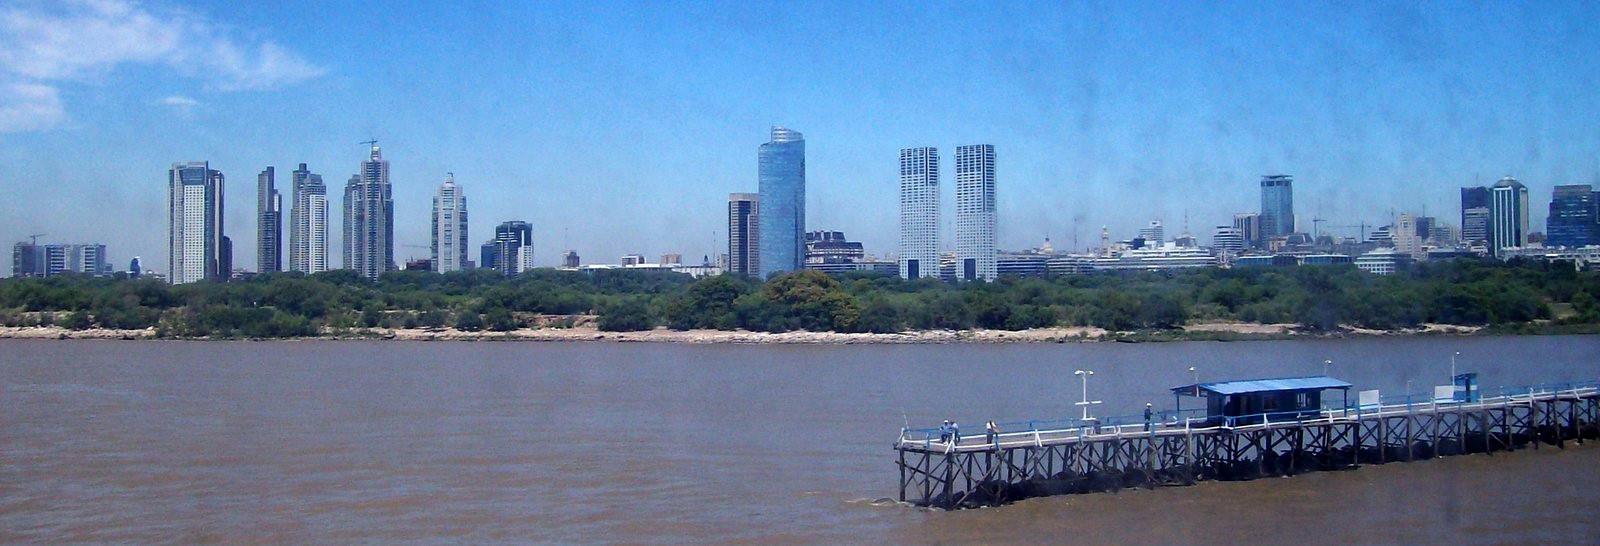 Reserva Natural Costanera Sur am Rio de la Plata